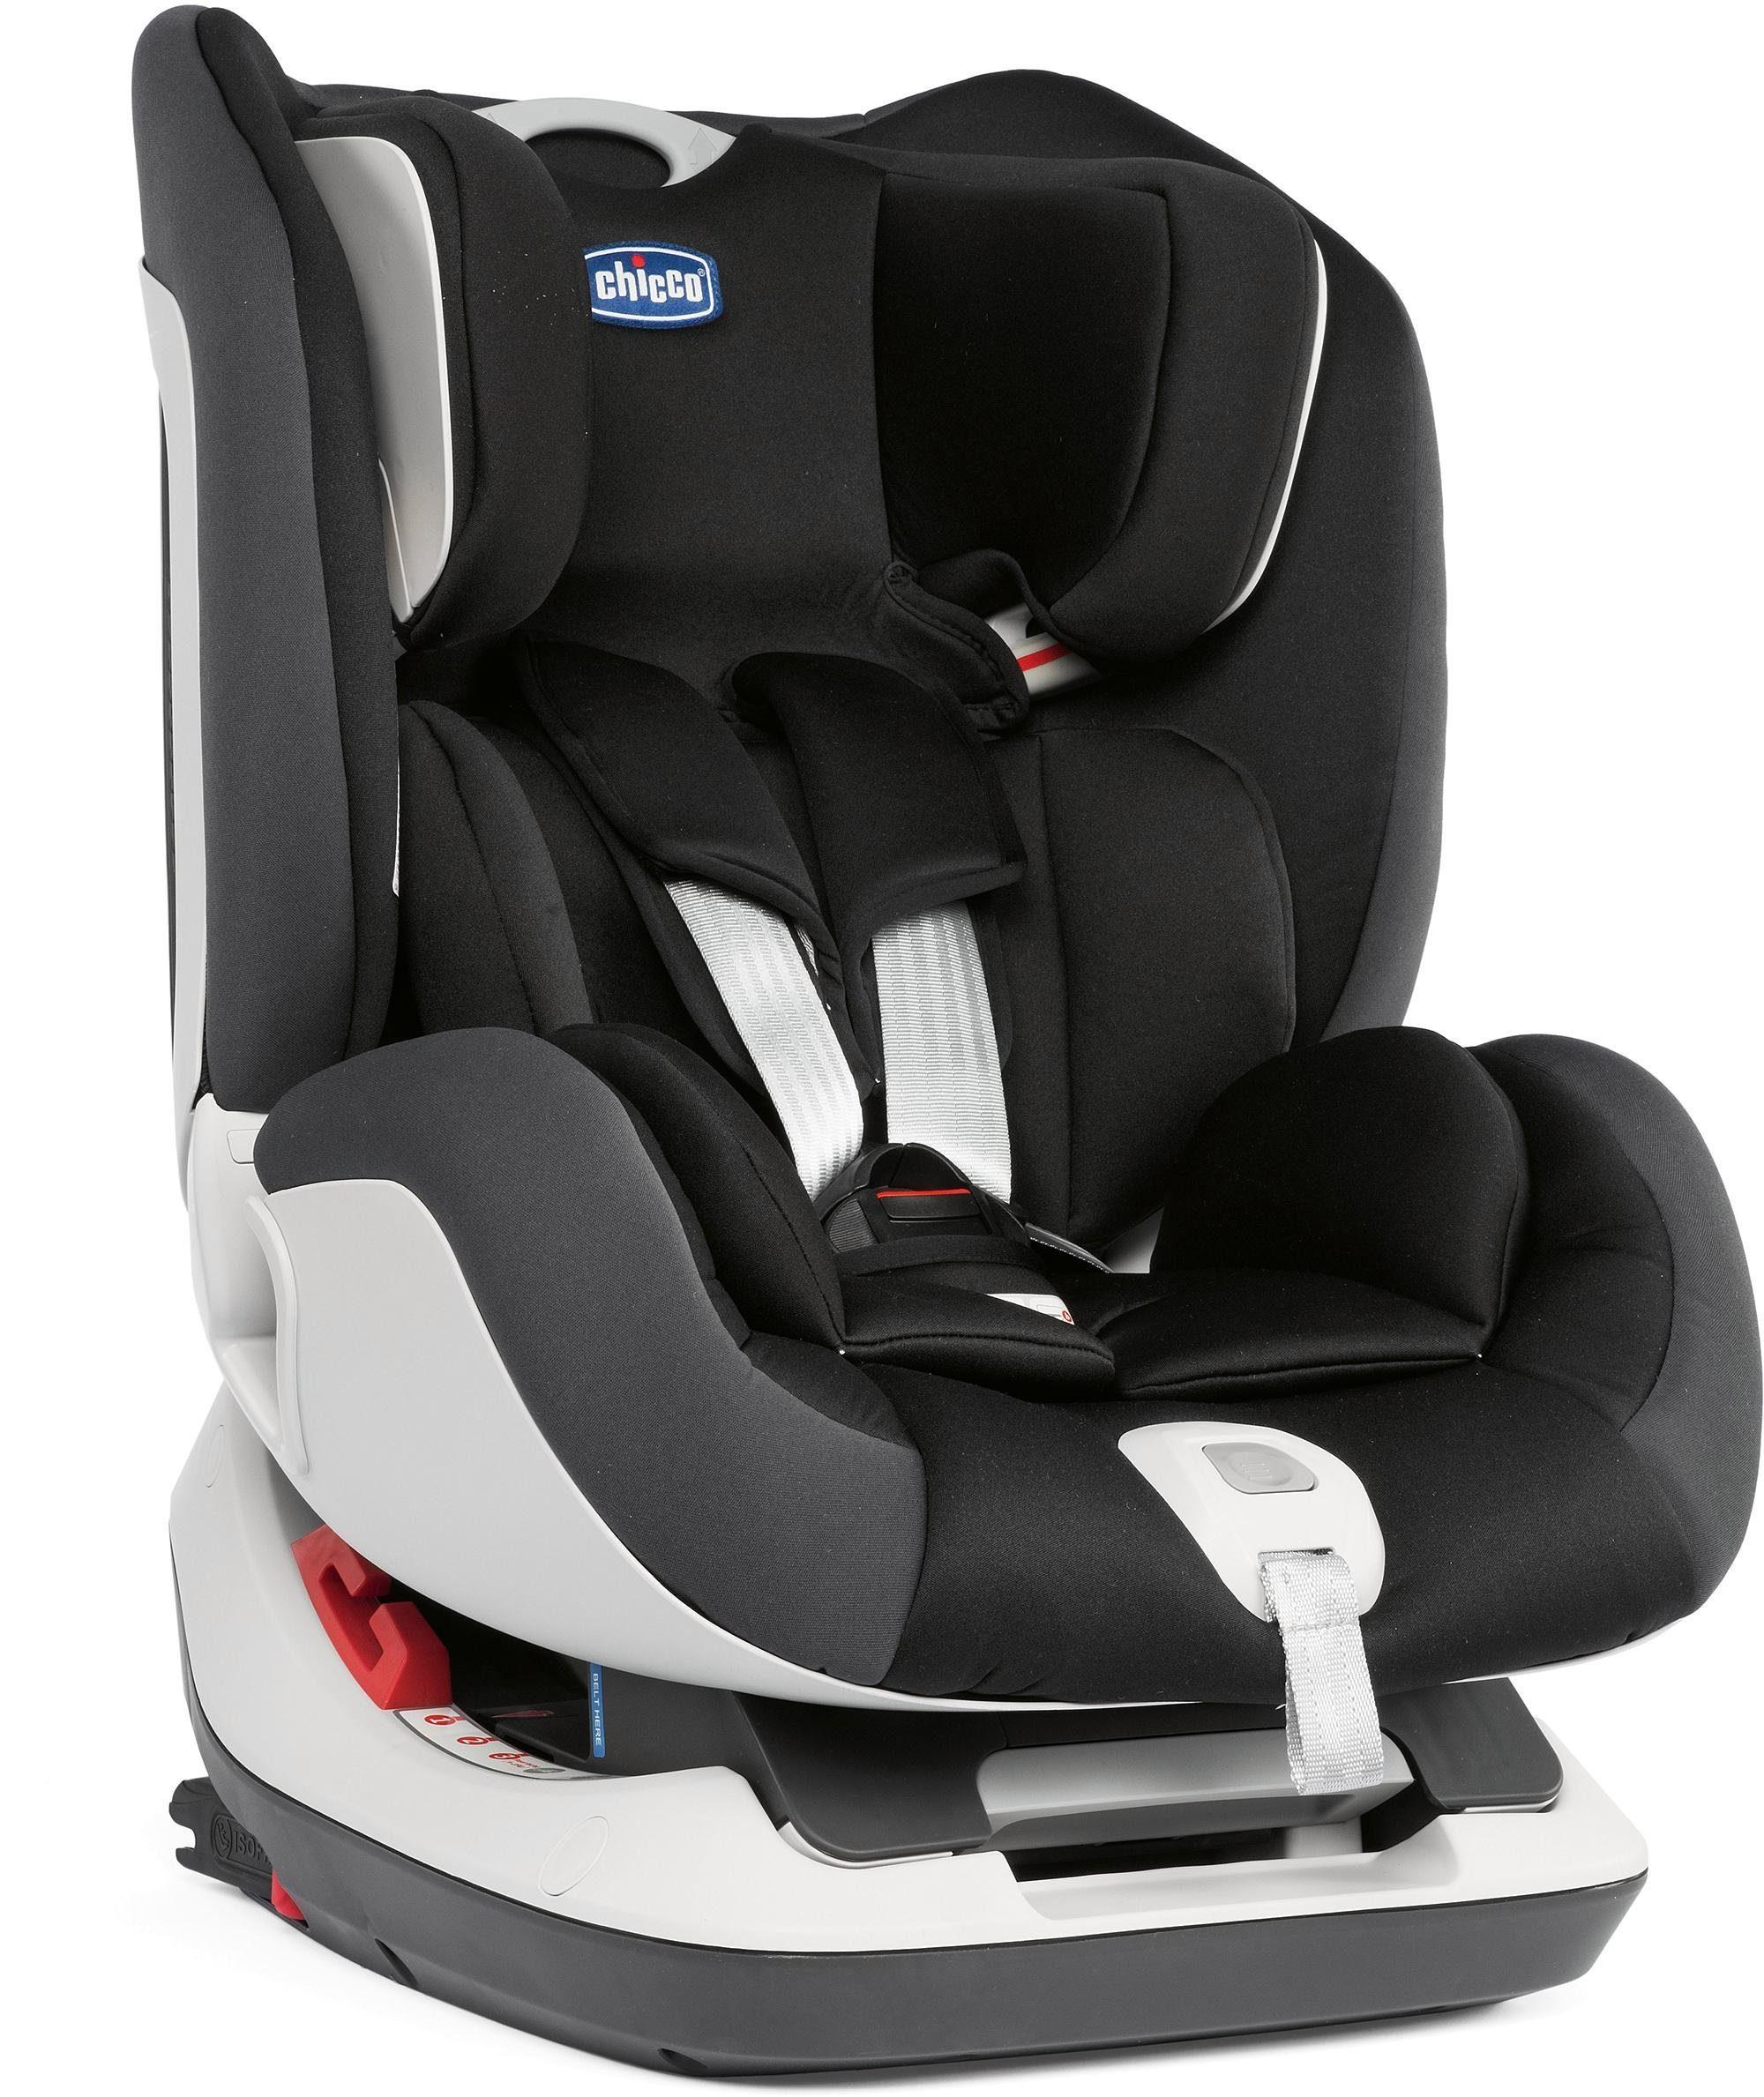 Chicco® Kindersitz, 0 - 25 kg, »Seat Up 012, Jet Black«